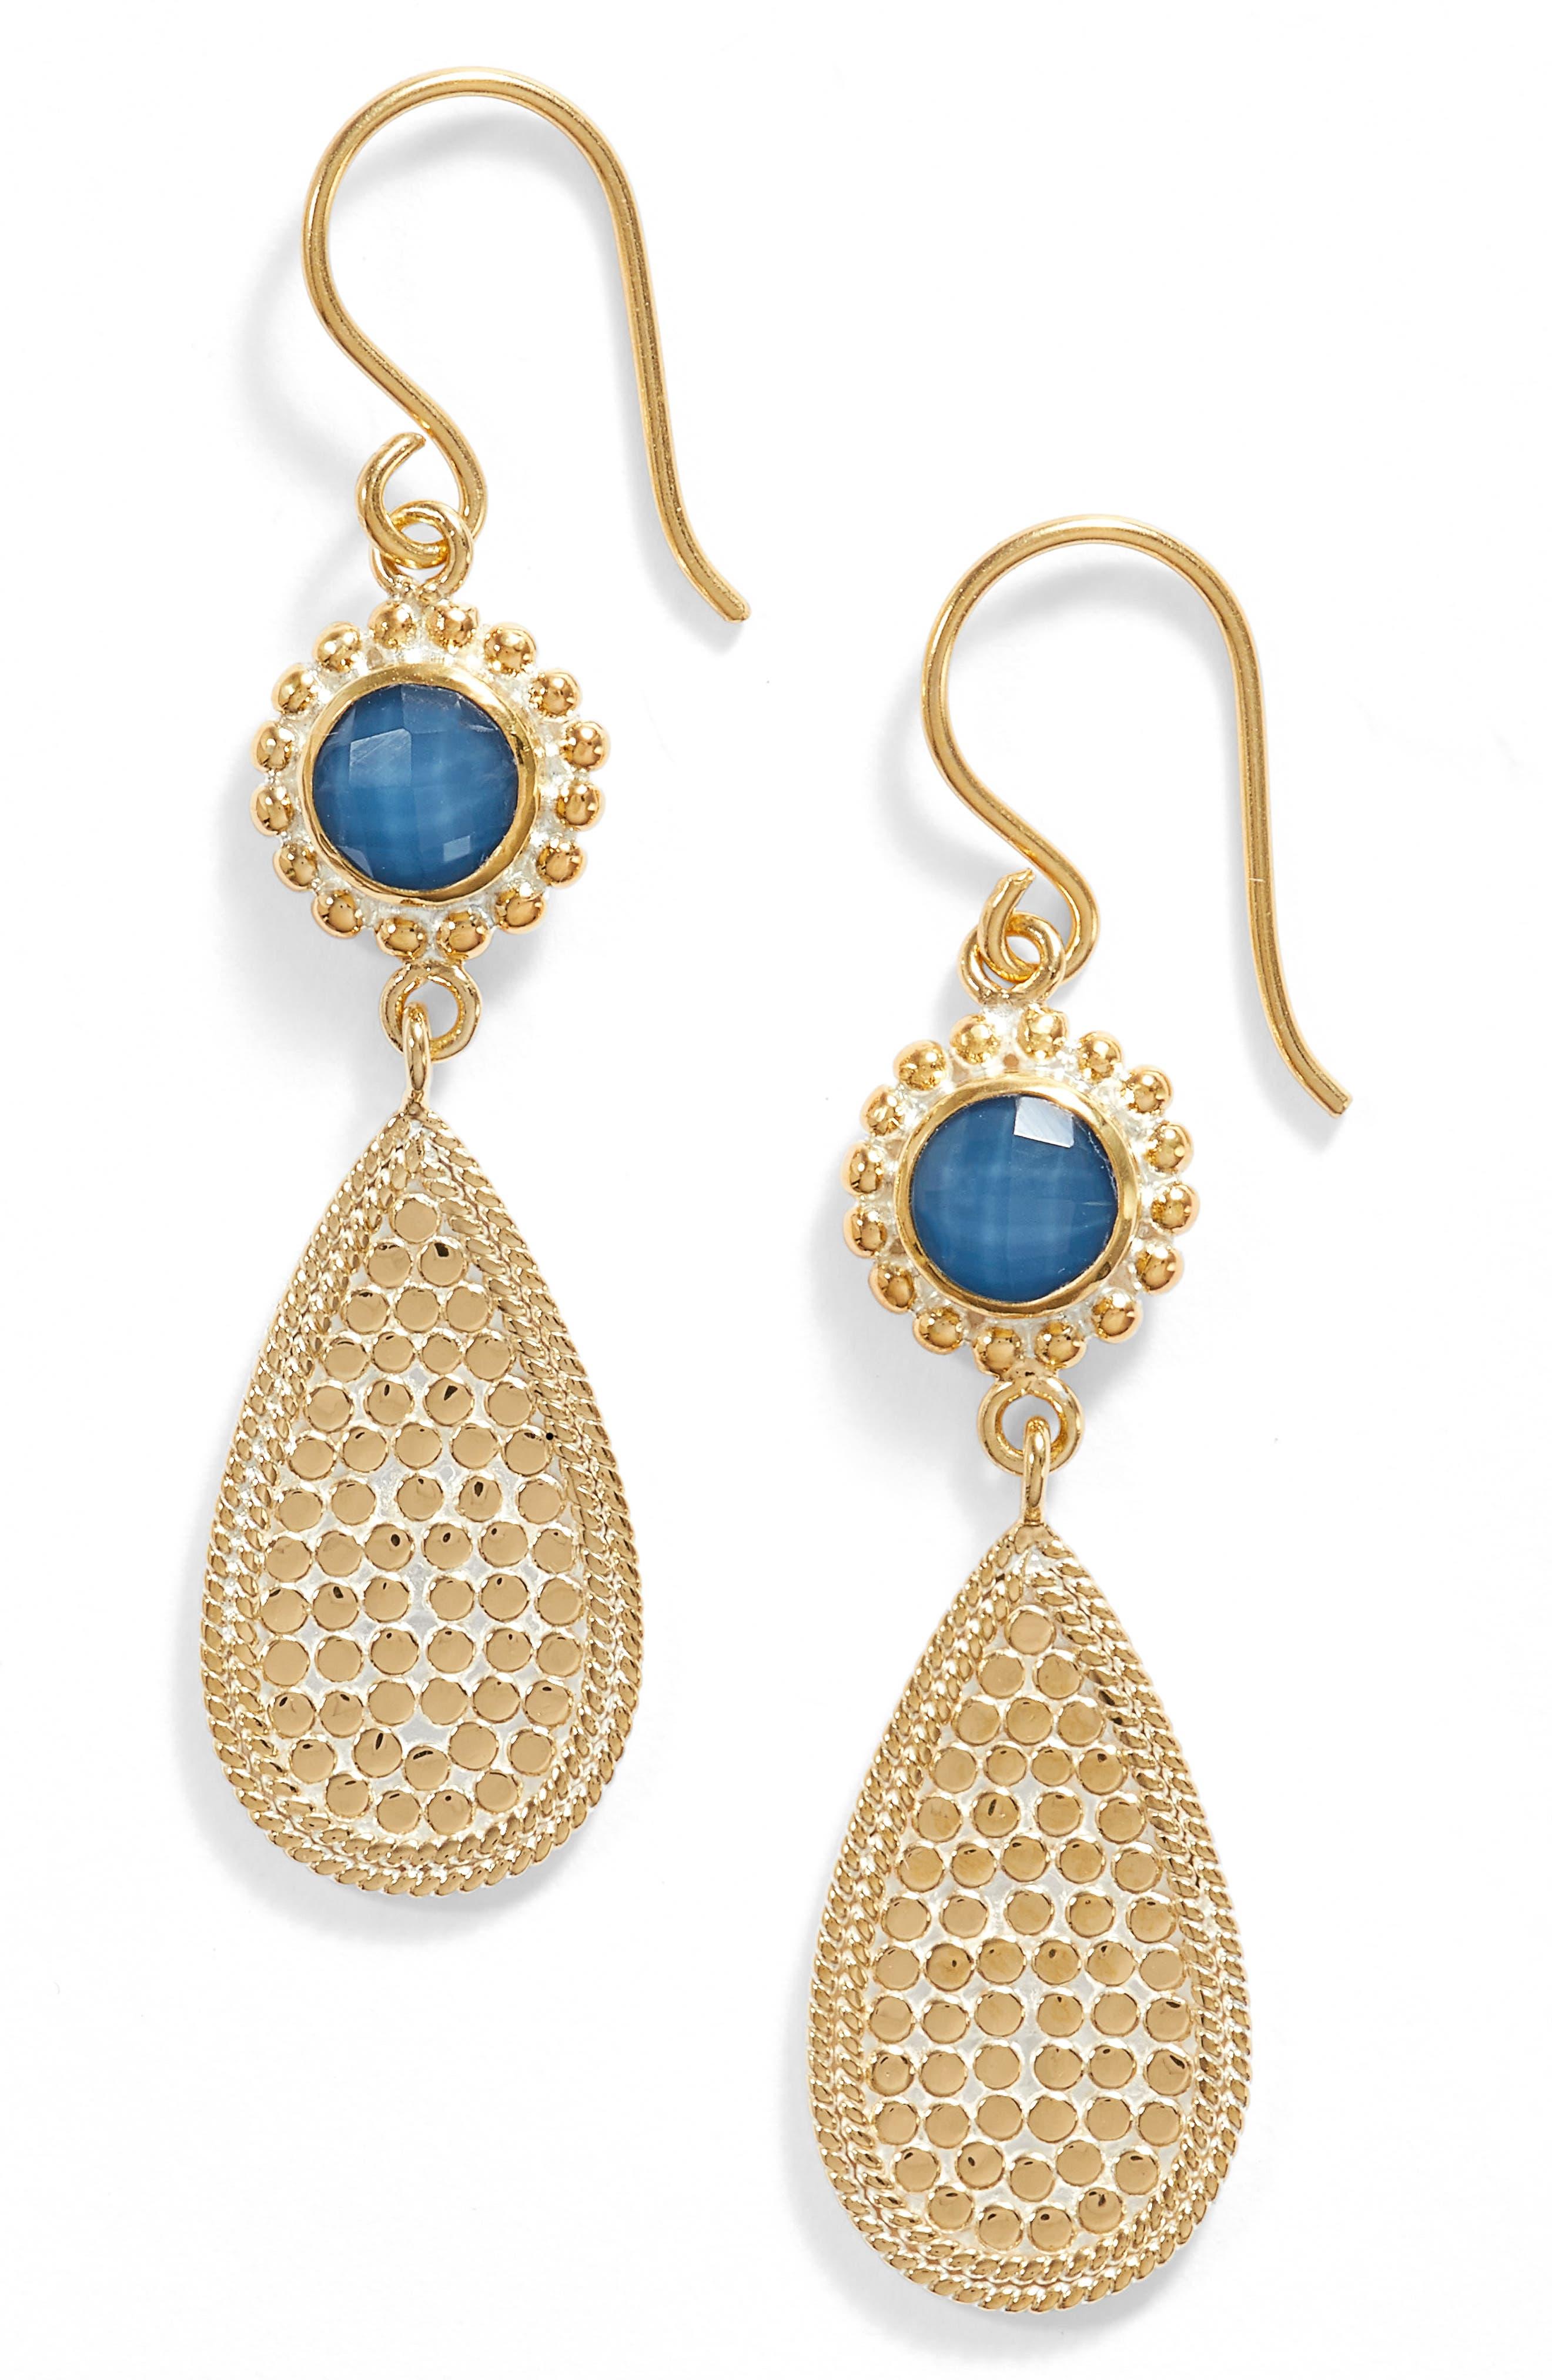 ANNA BECK Blue Quartz Double Drop Earrings